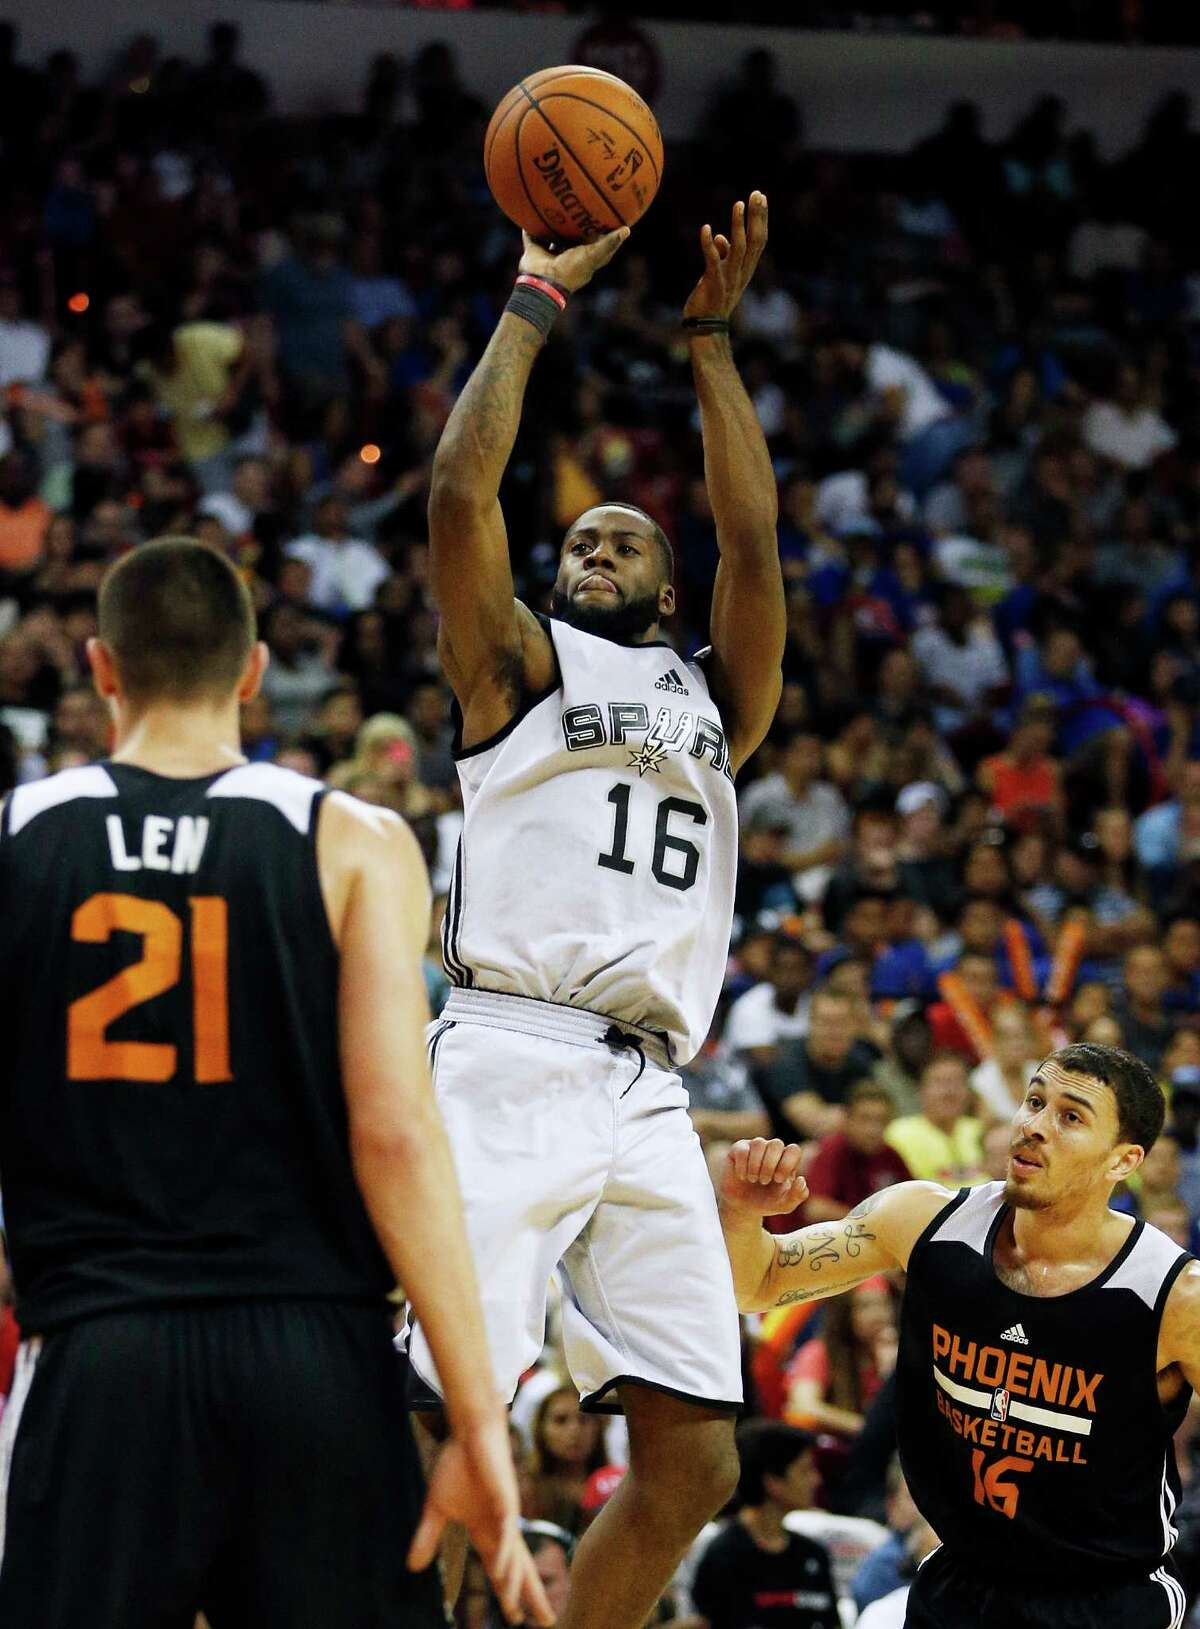 San Antonio Spurs Jonathon Simmons shoots against the Phoenix Suns during the first half of an NBA summer league game on July 20, 2015, in Las Vegas. (AP Photo/John Locher)